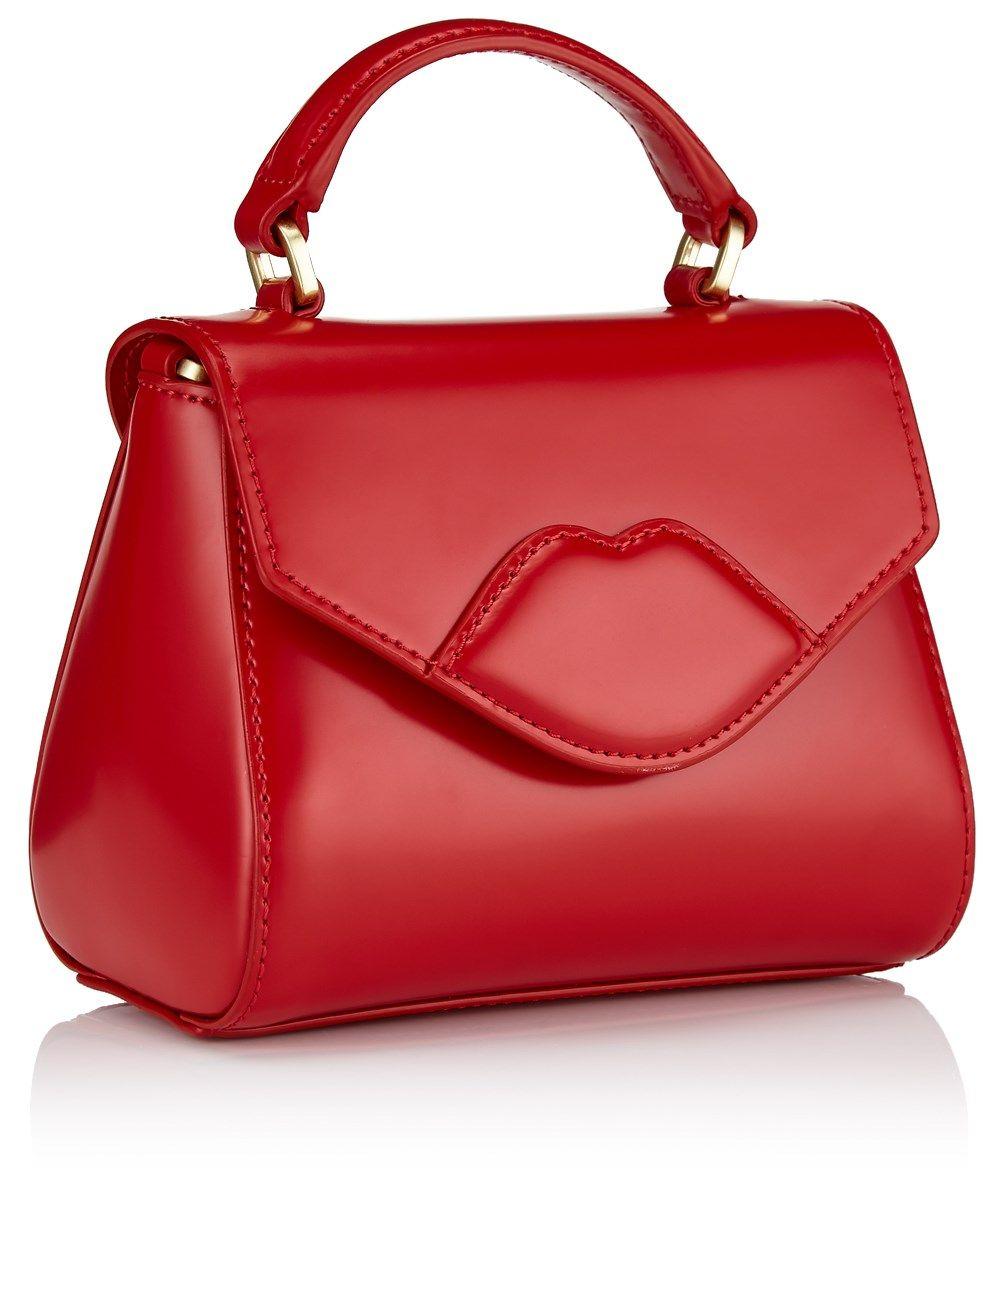 Red Leather Mini Lips Bag Lulu Guinness #bag #purse #handbag ...